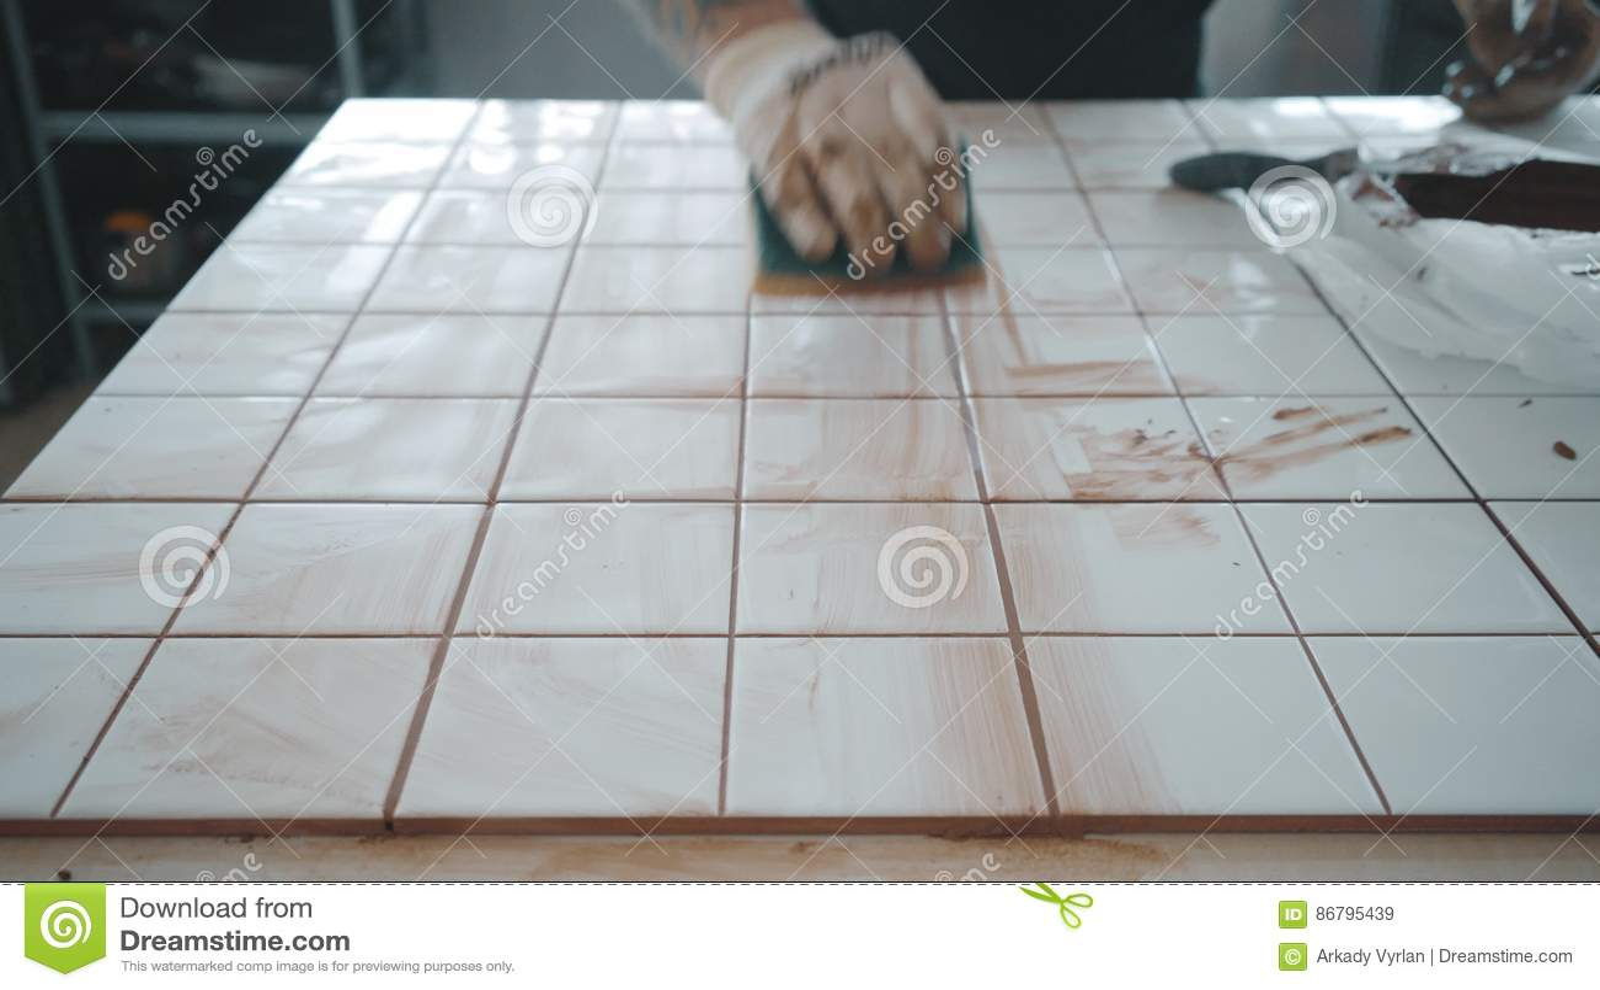 Tattooed Man Applies Ceramic Tiles On Kitchen Table Set Stock Video ...